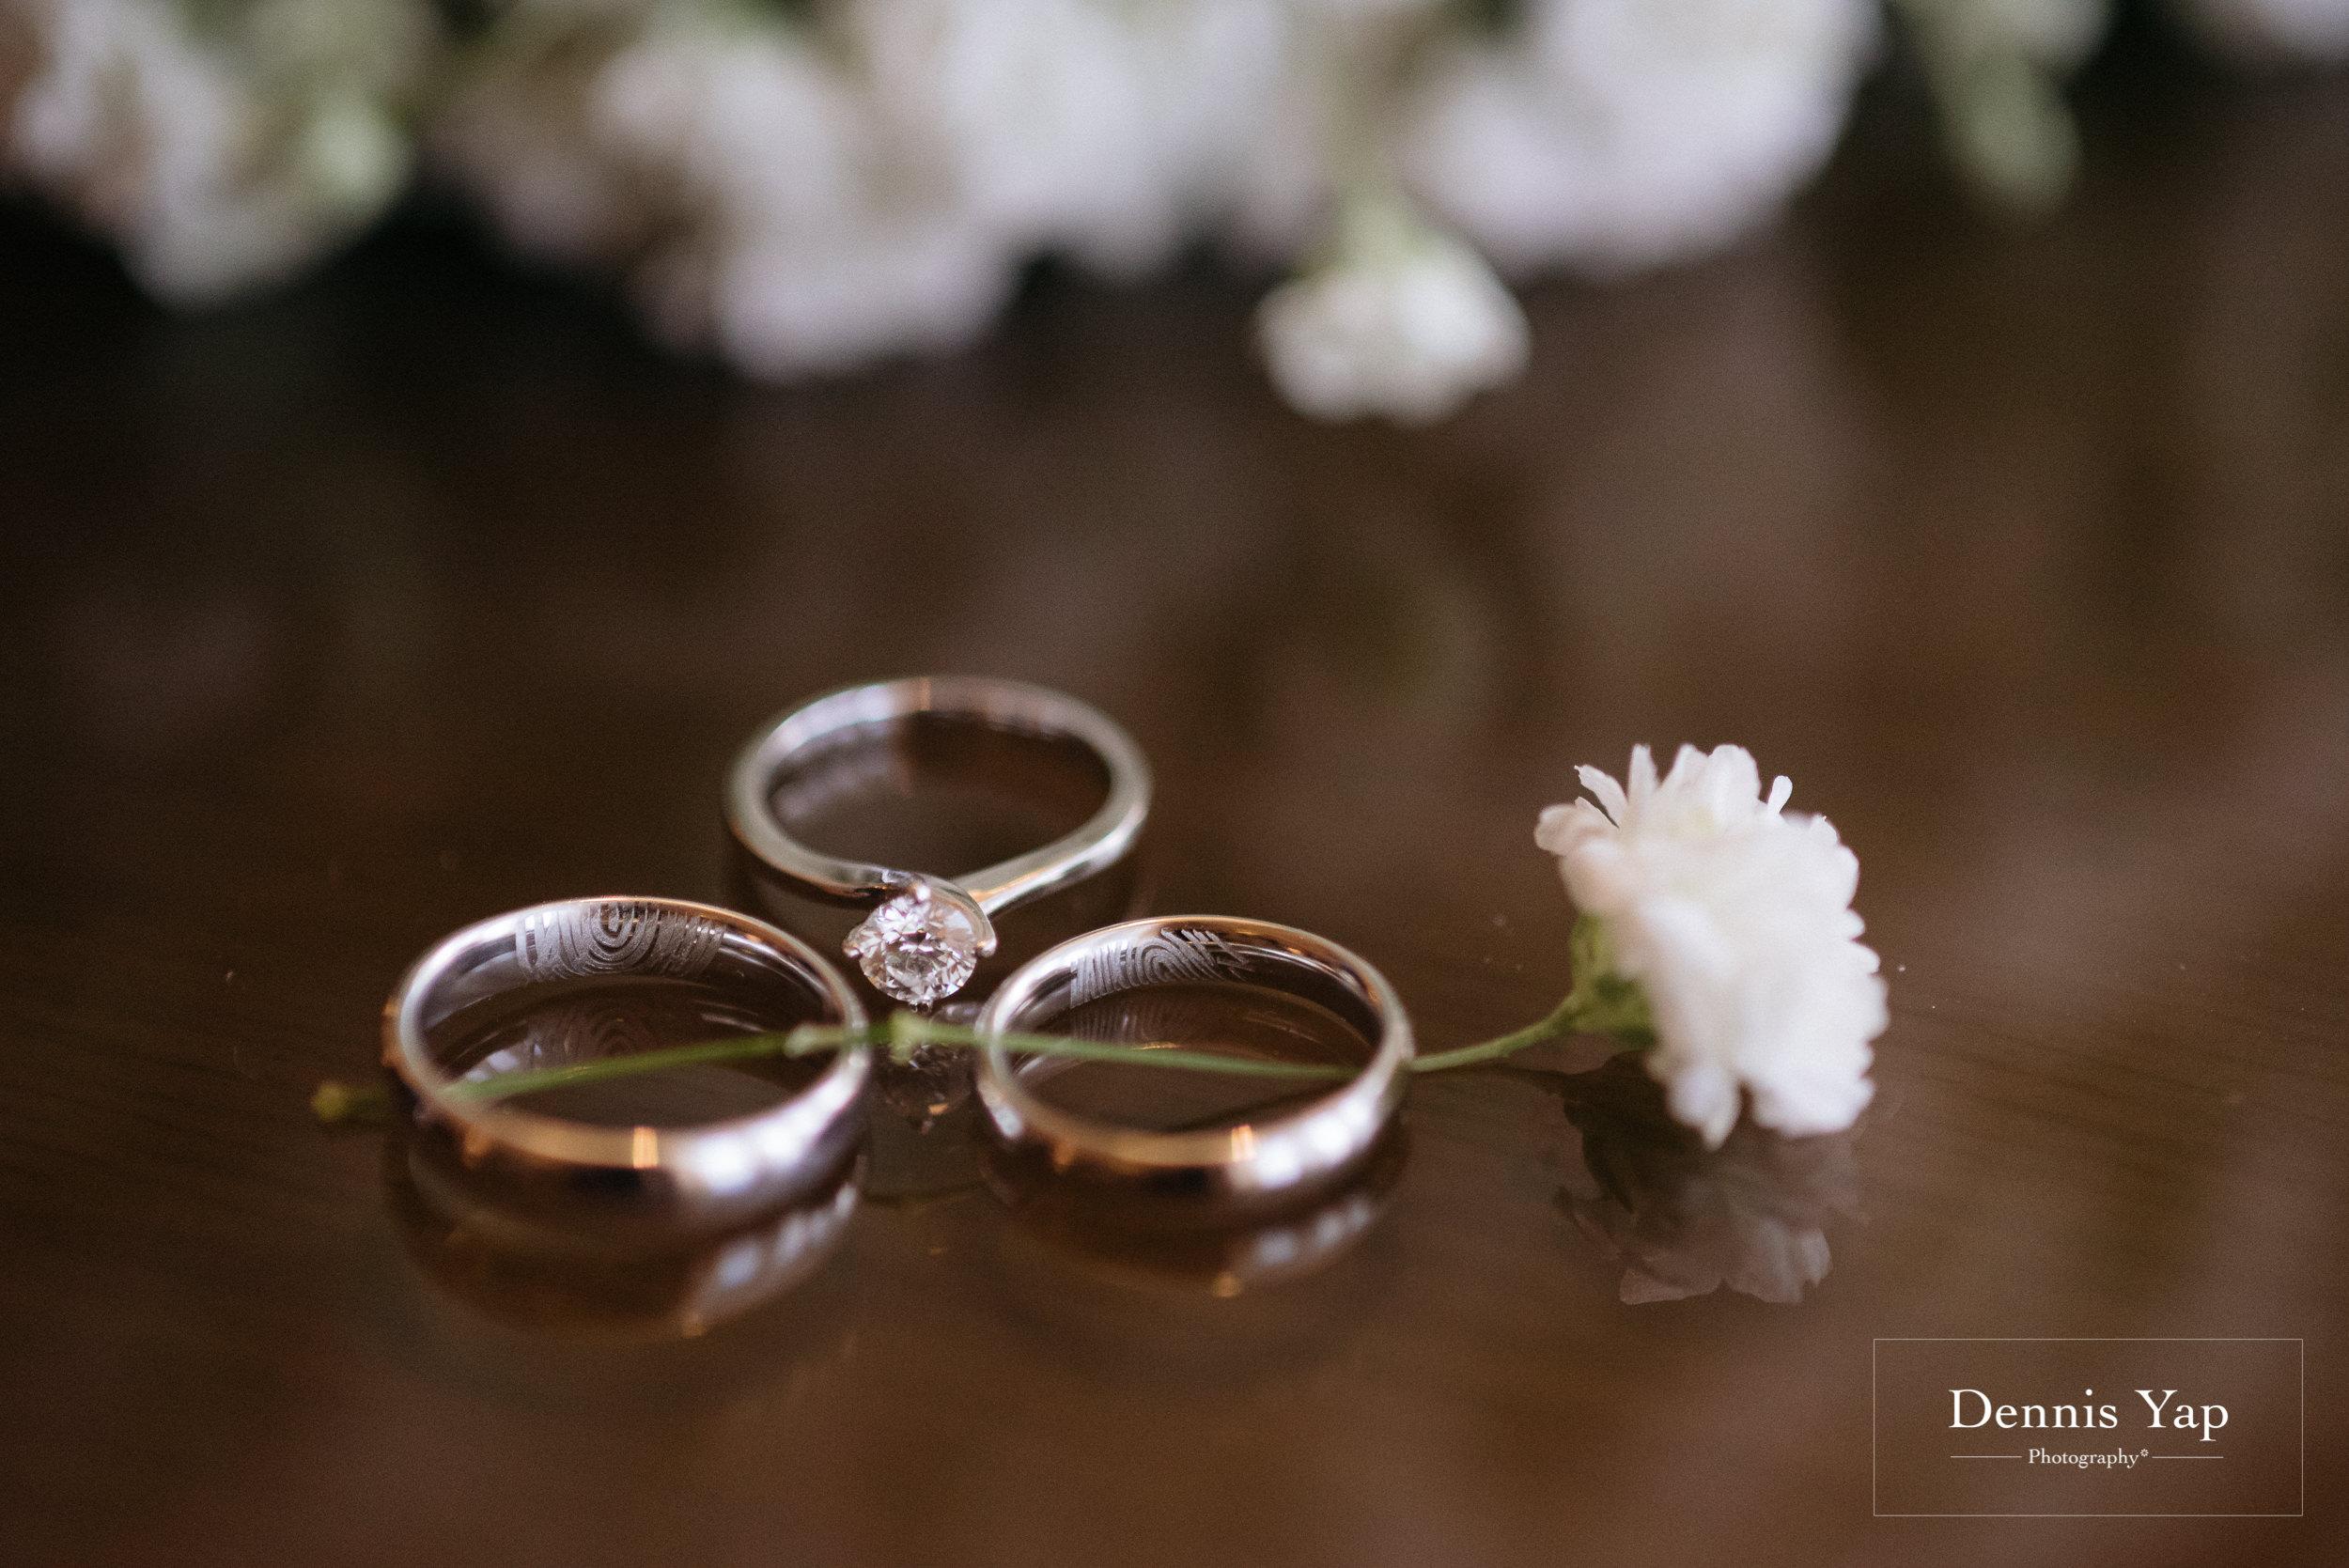 taylai cheng yee garden wedding saujana hotel subang jaya dennis yap photography sunlight-1.jpg